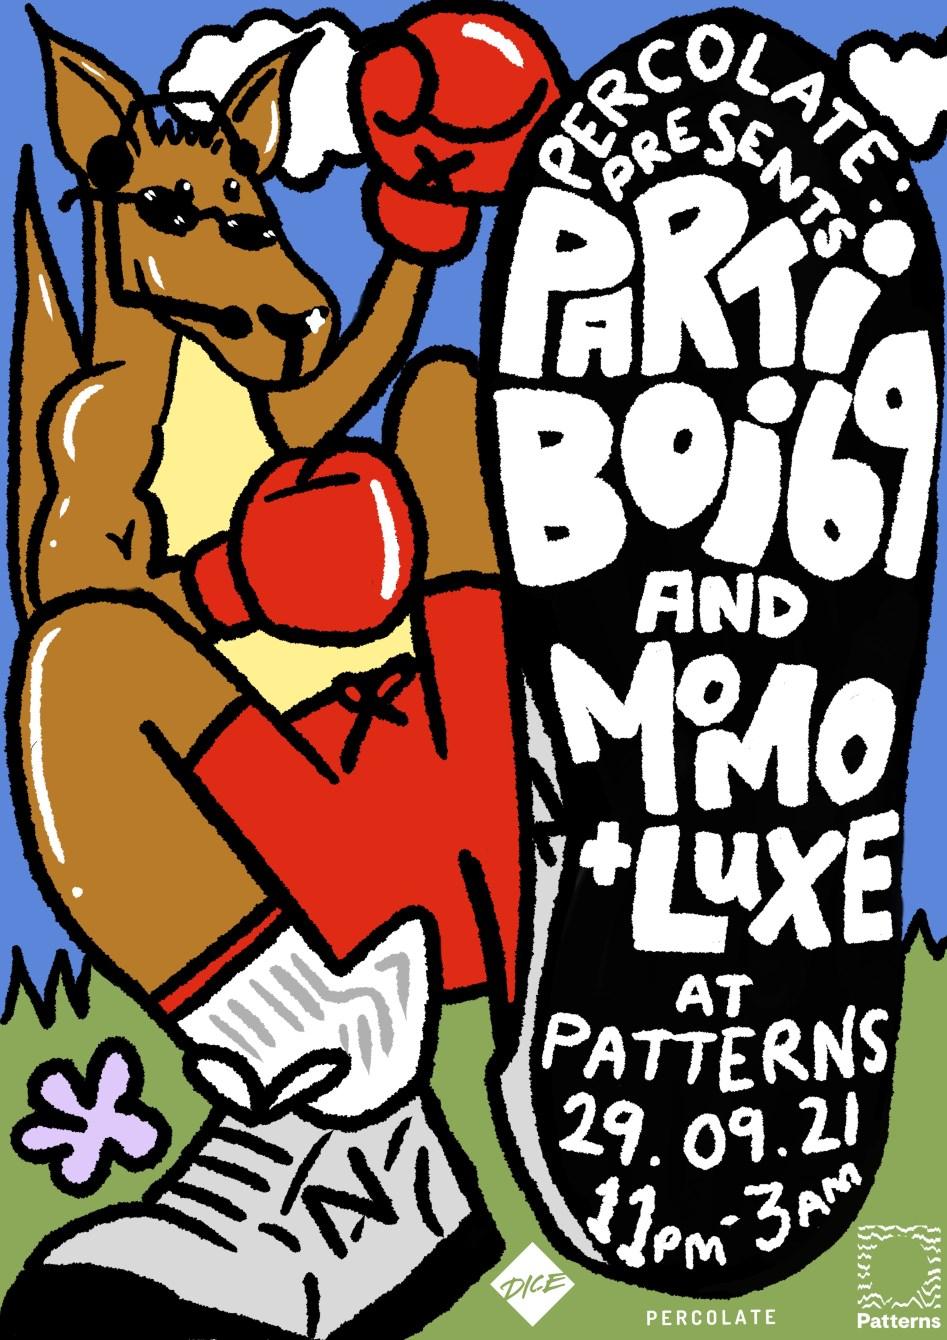 Partiboi69 - Flyer front